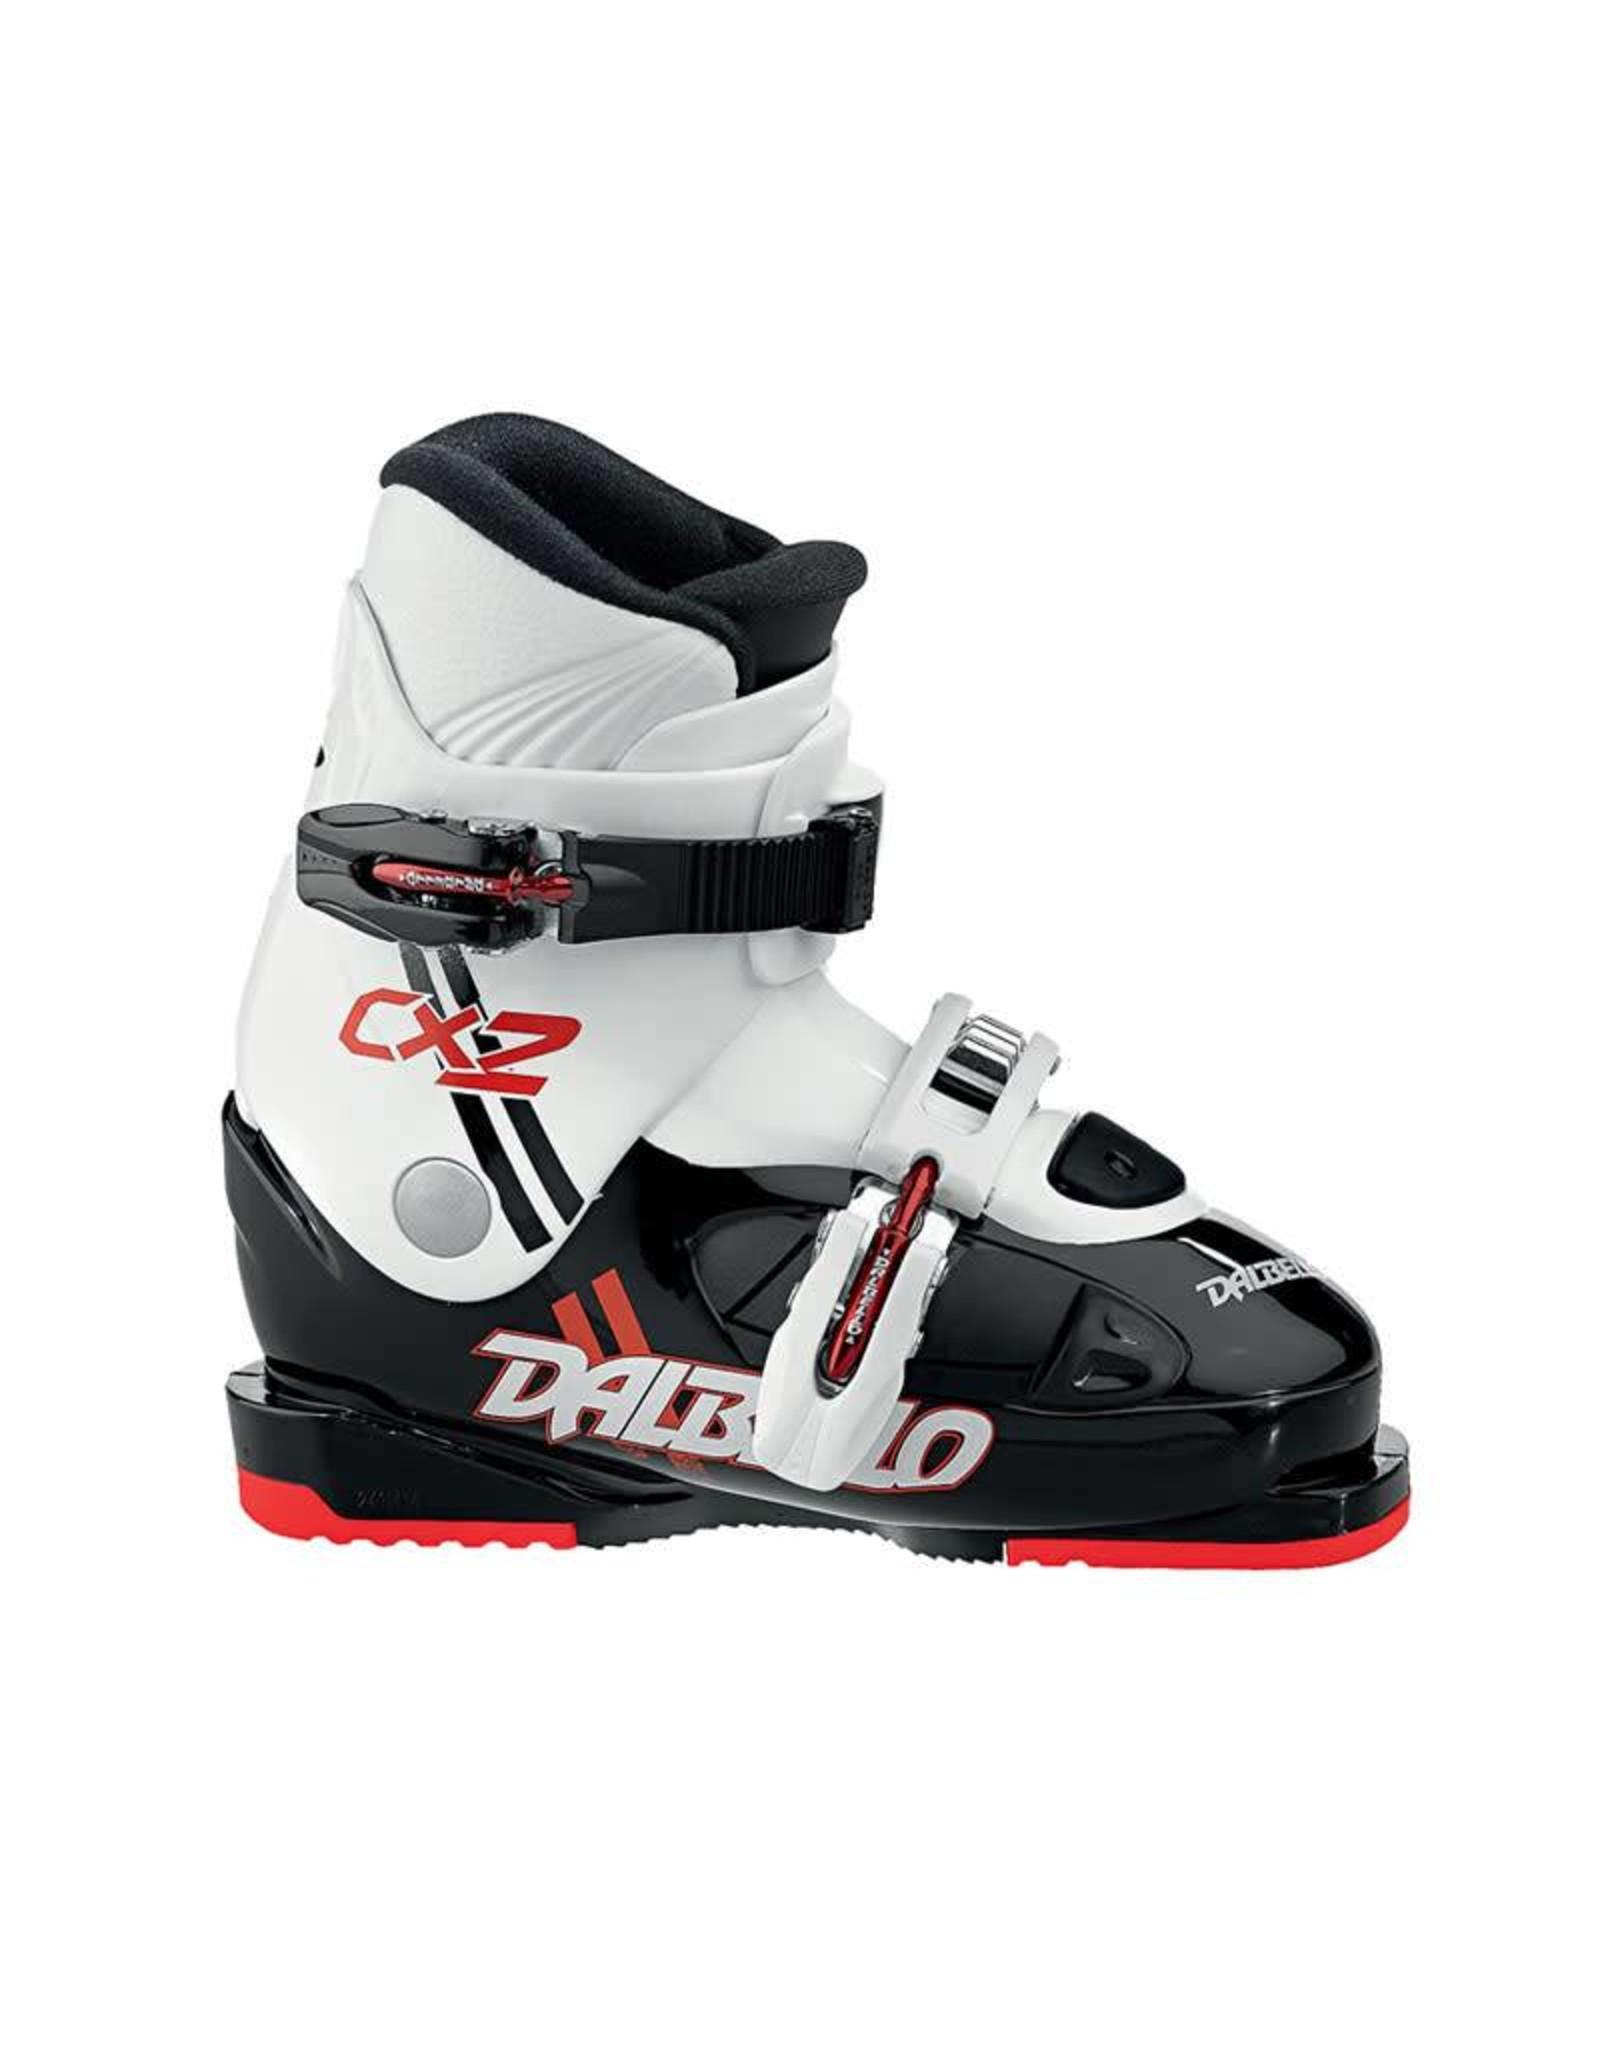 DALBELLO Skischoenen DALBELLO CX 2 (N)  Gebruikt